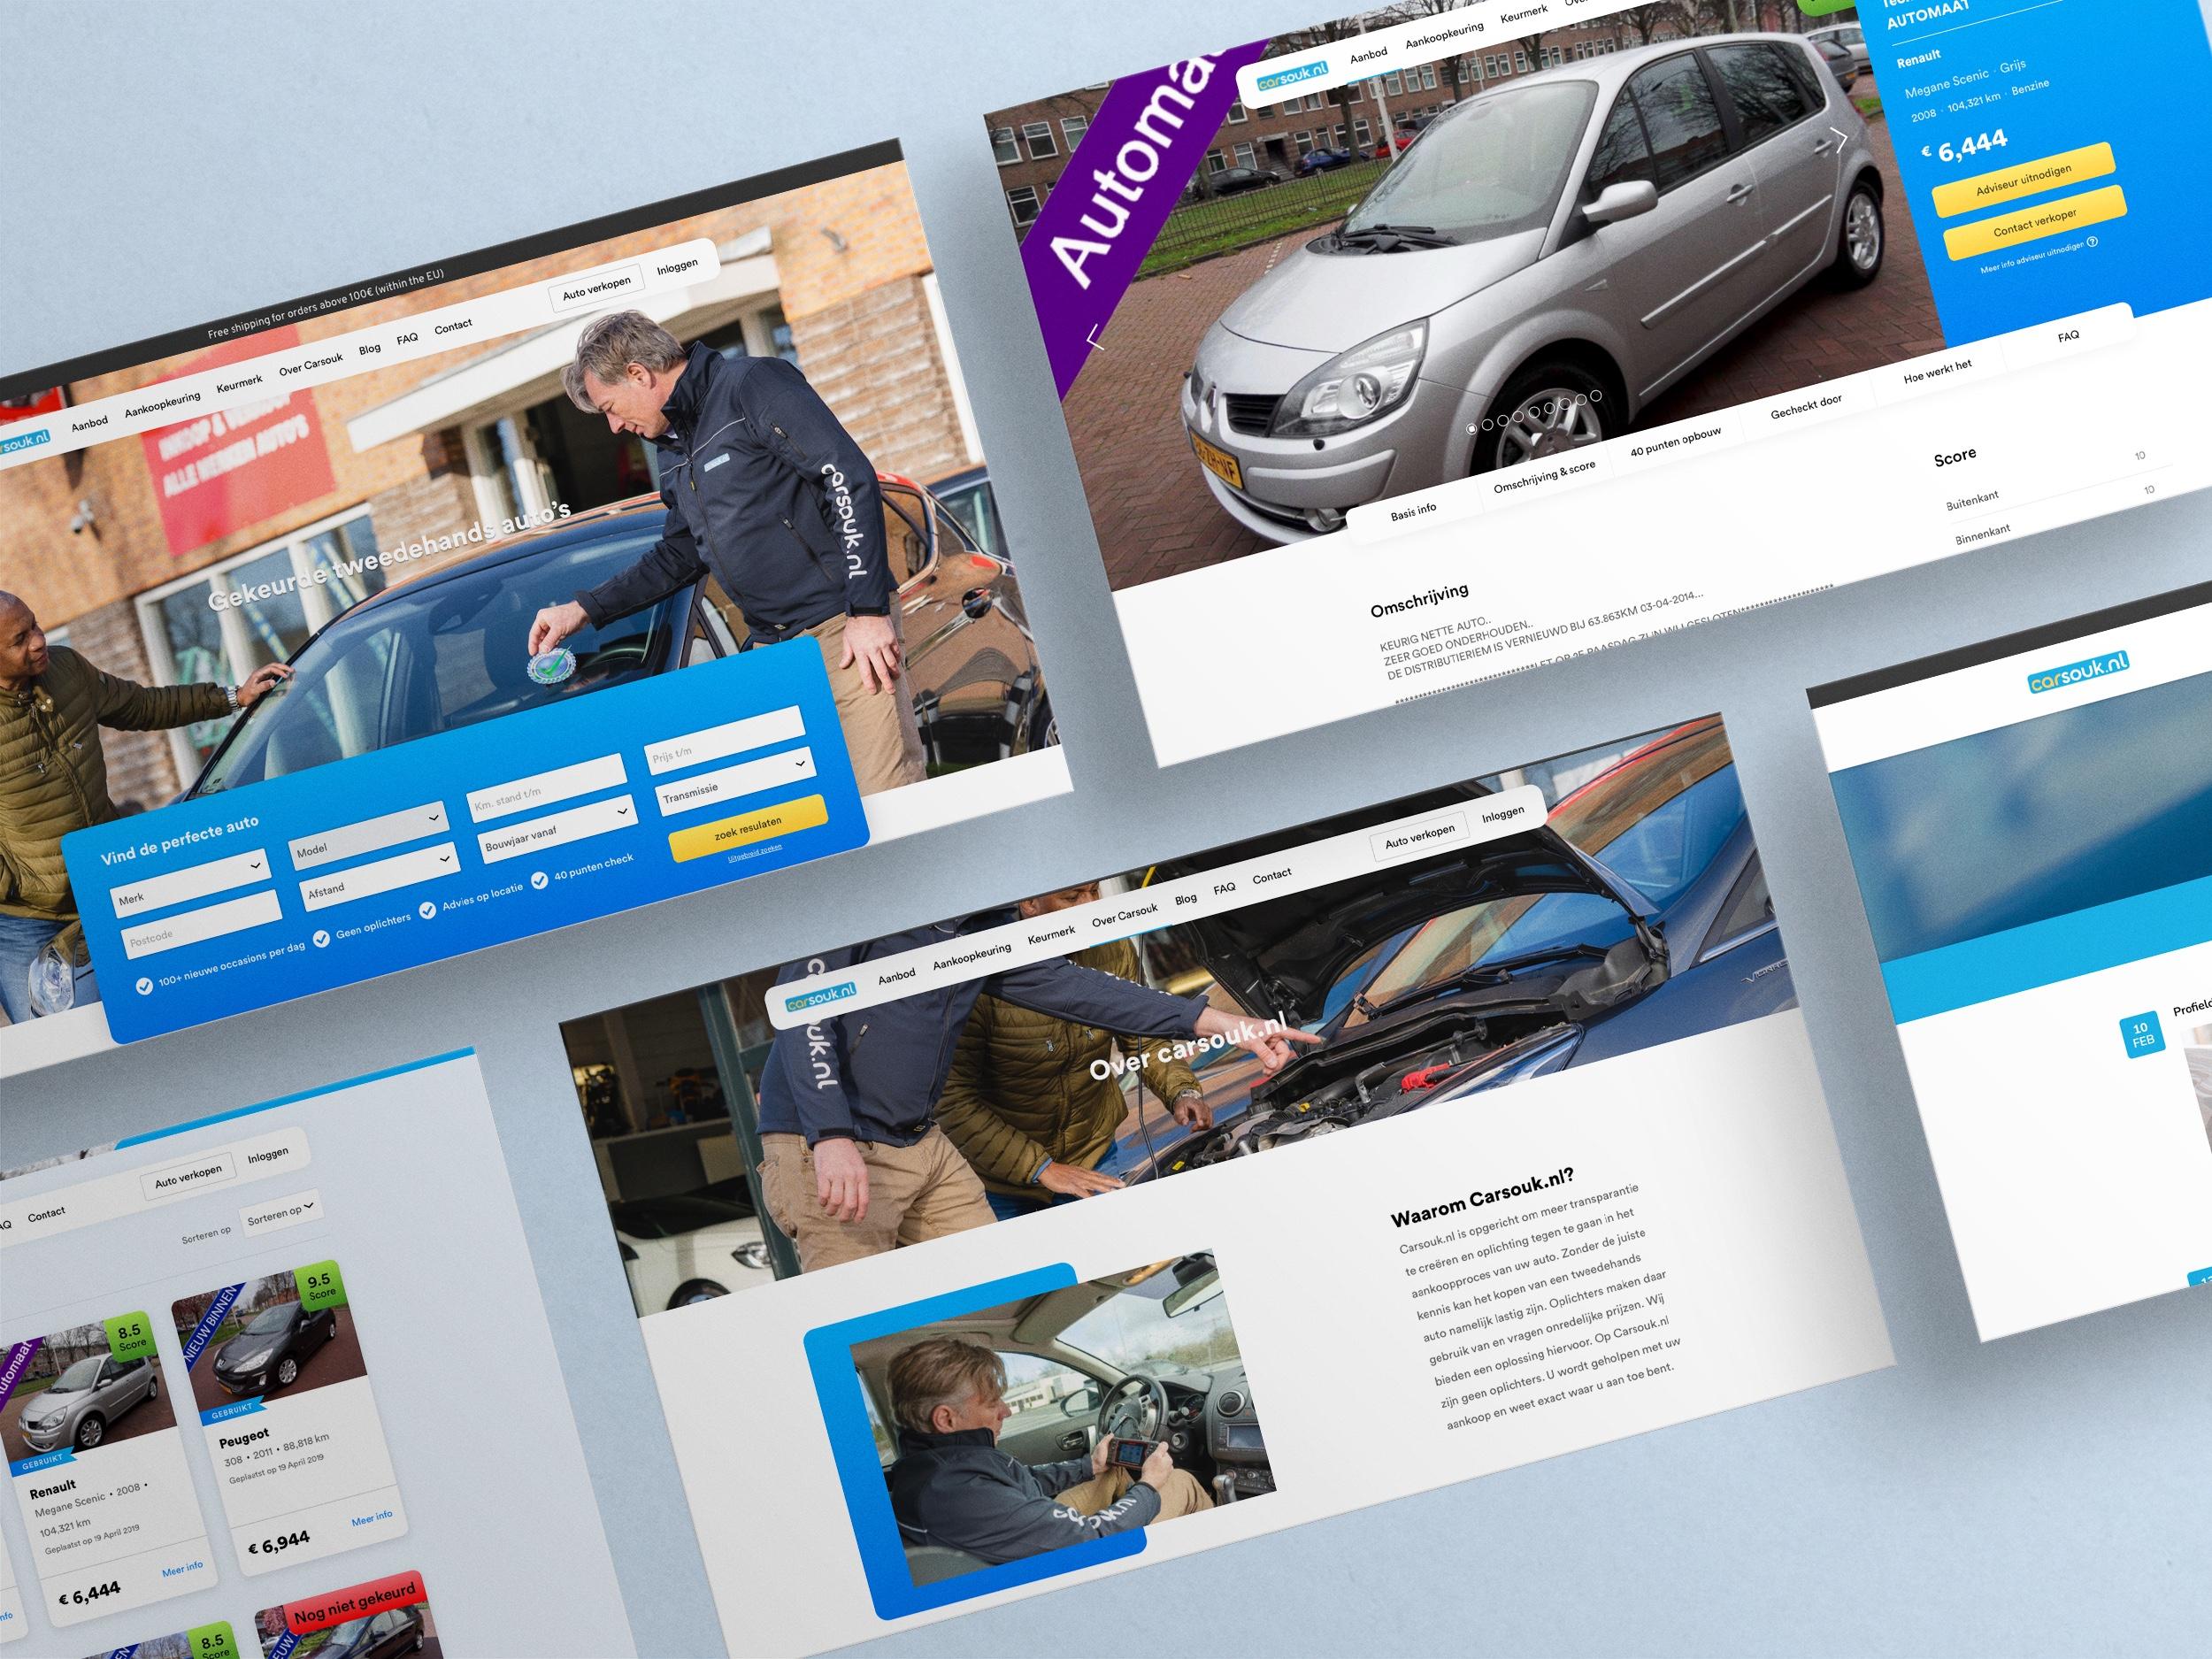 Carsouk - Website / Online Marketplace